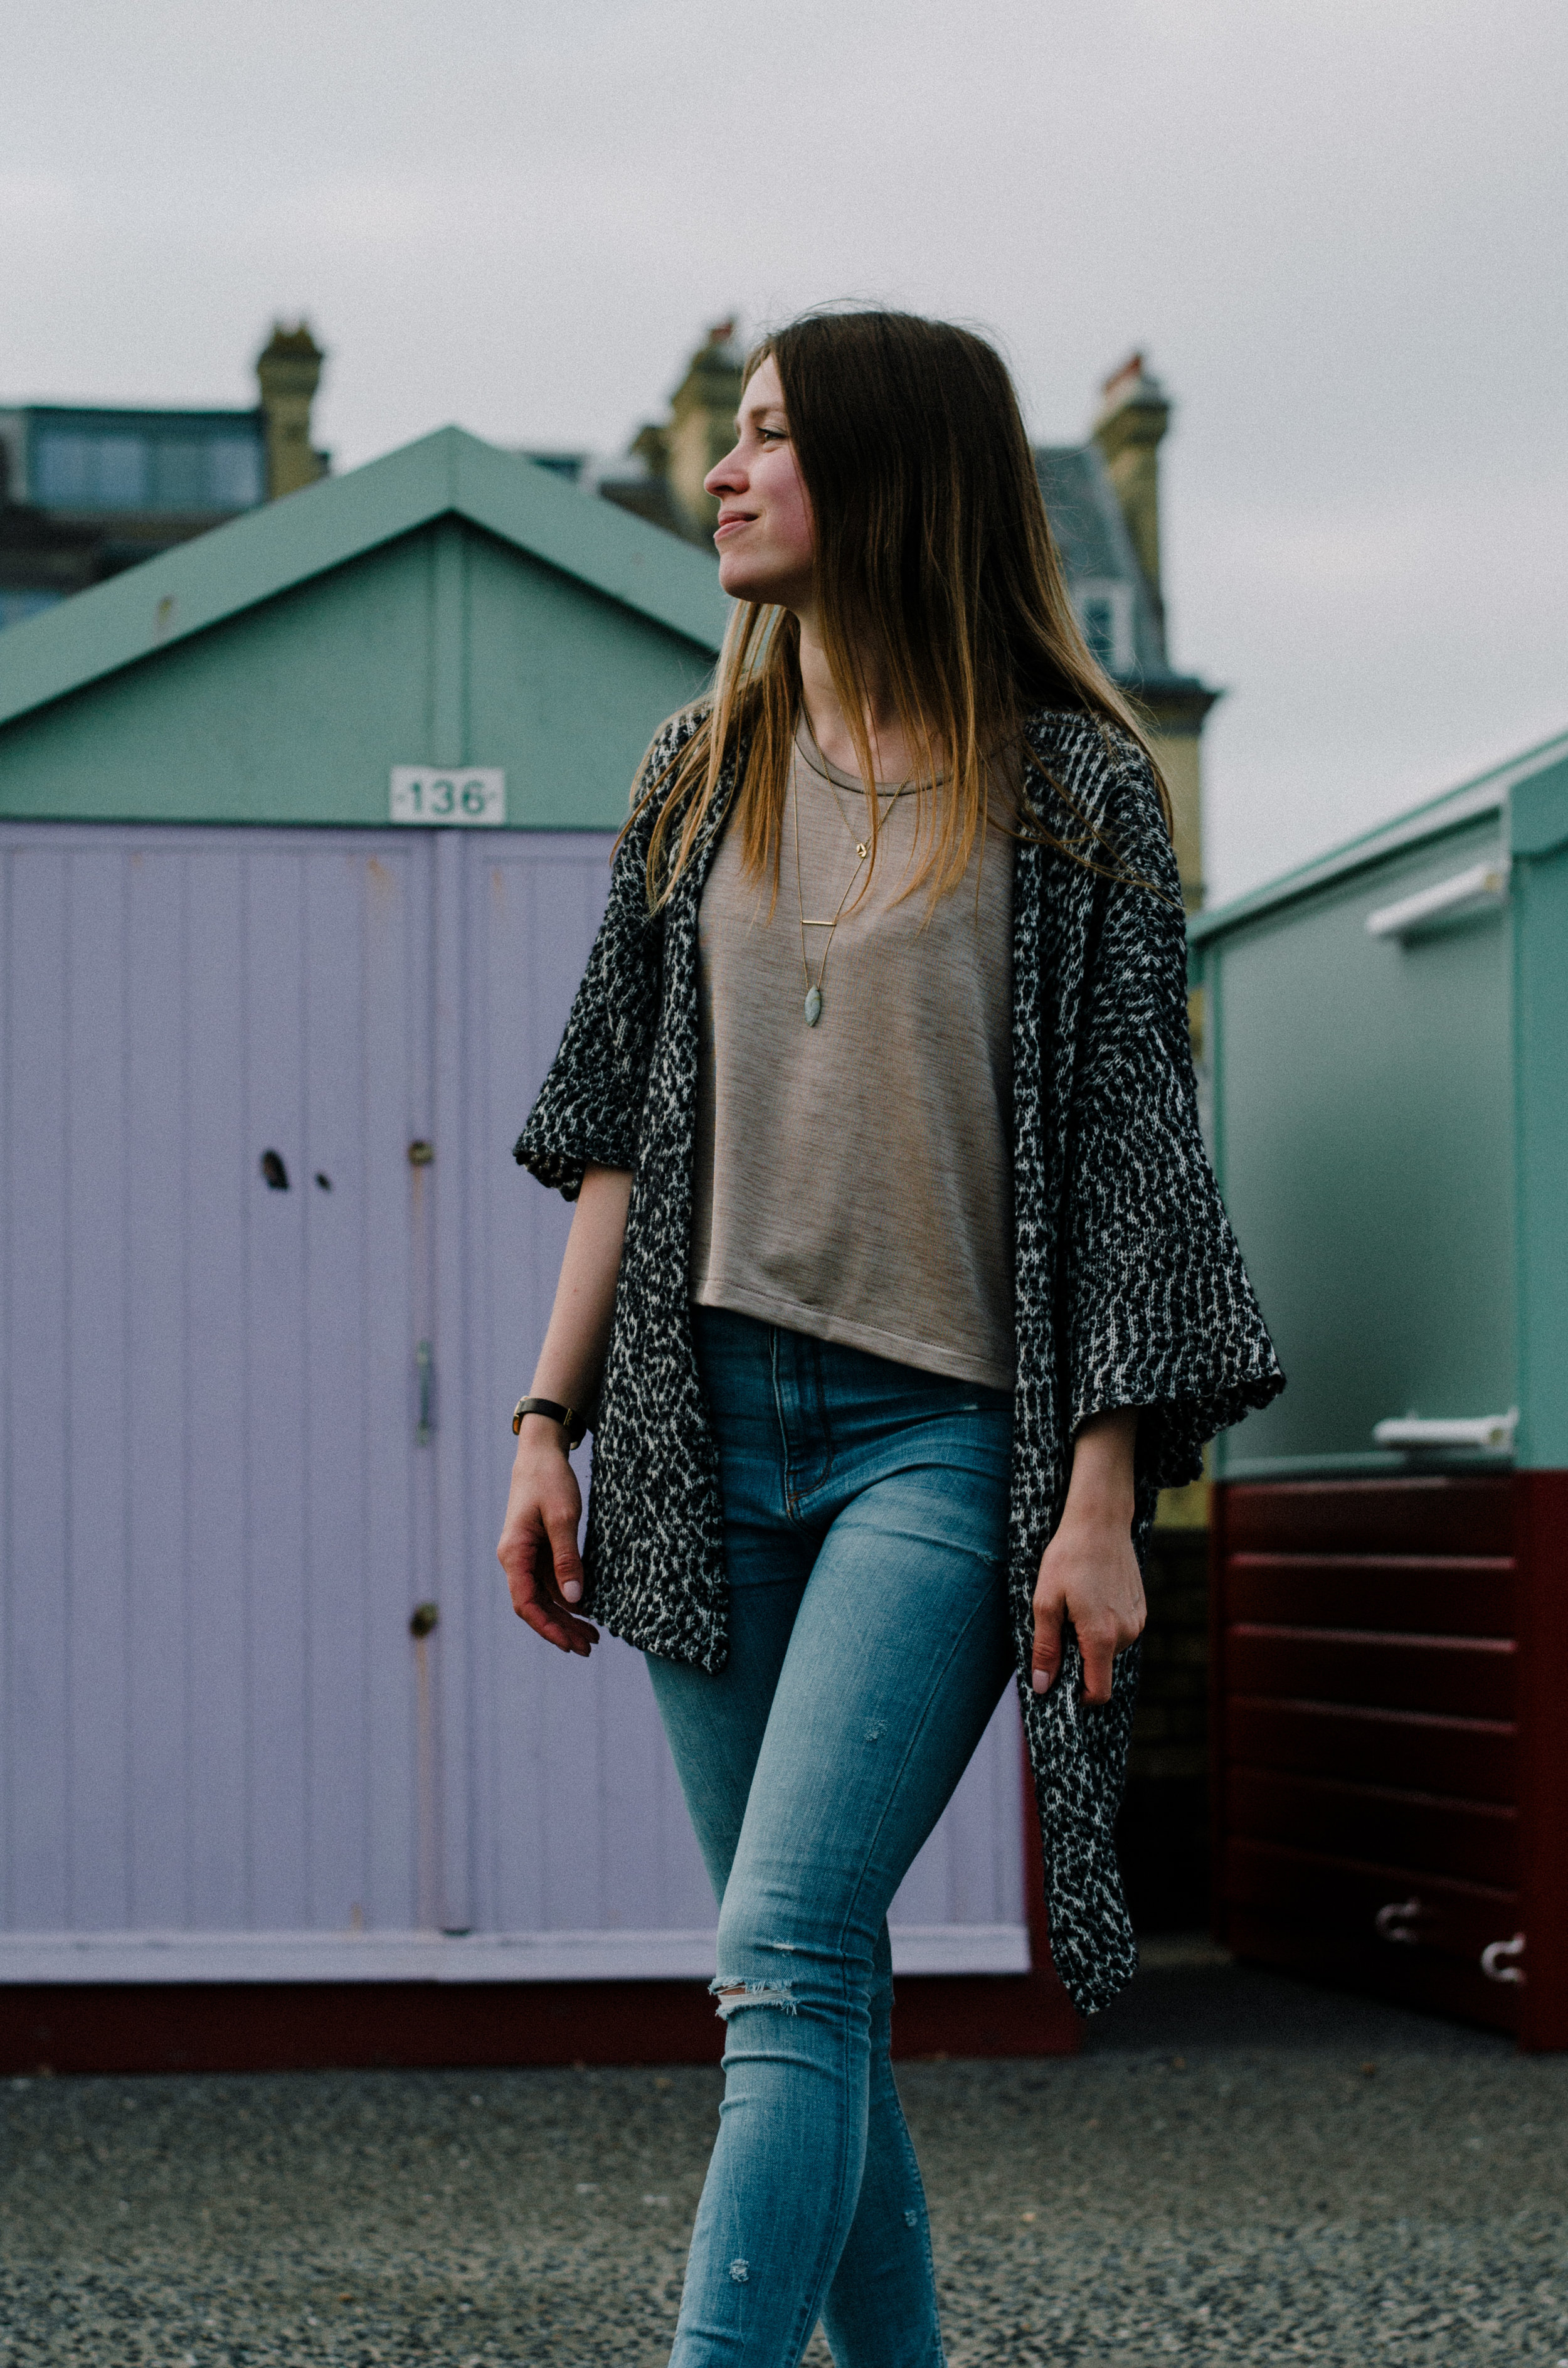 Lina - Portraits in Brighton - Aiste Saulyte Photography-11.jpg